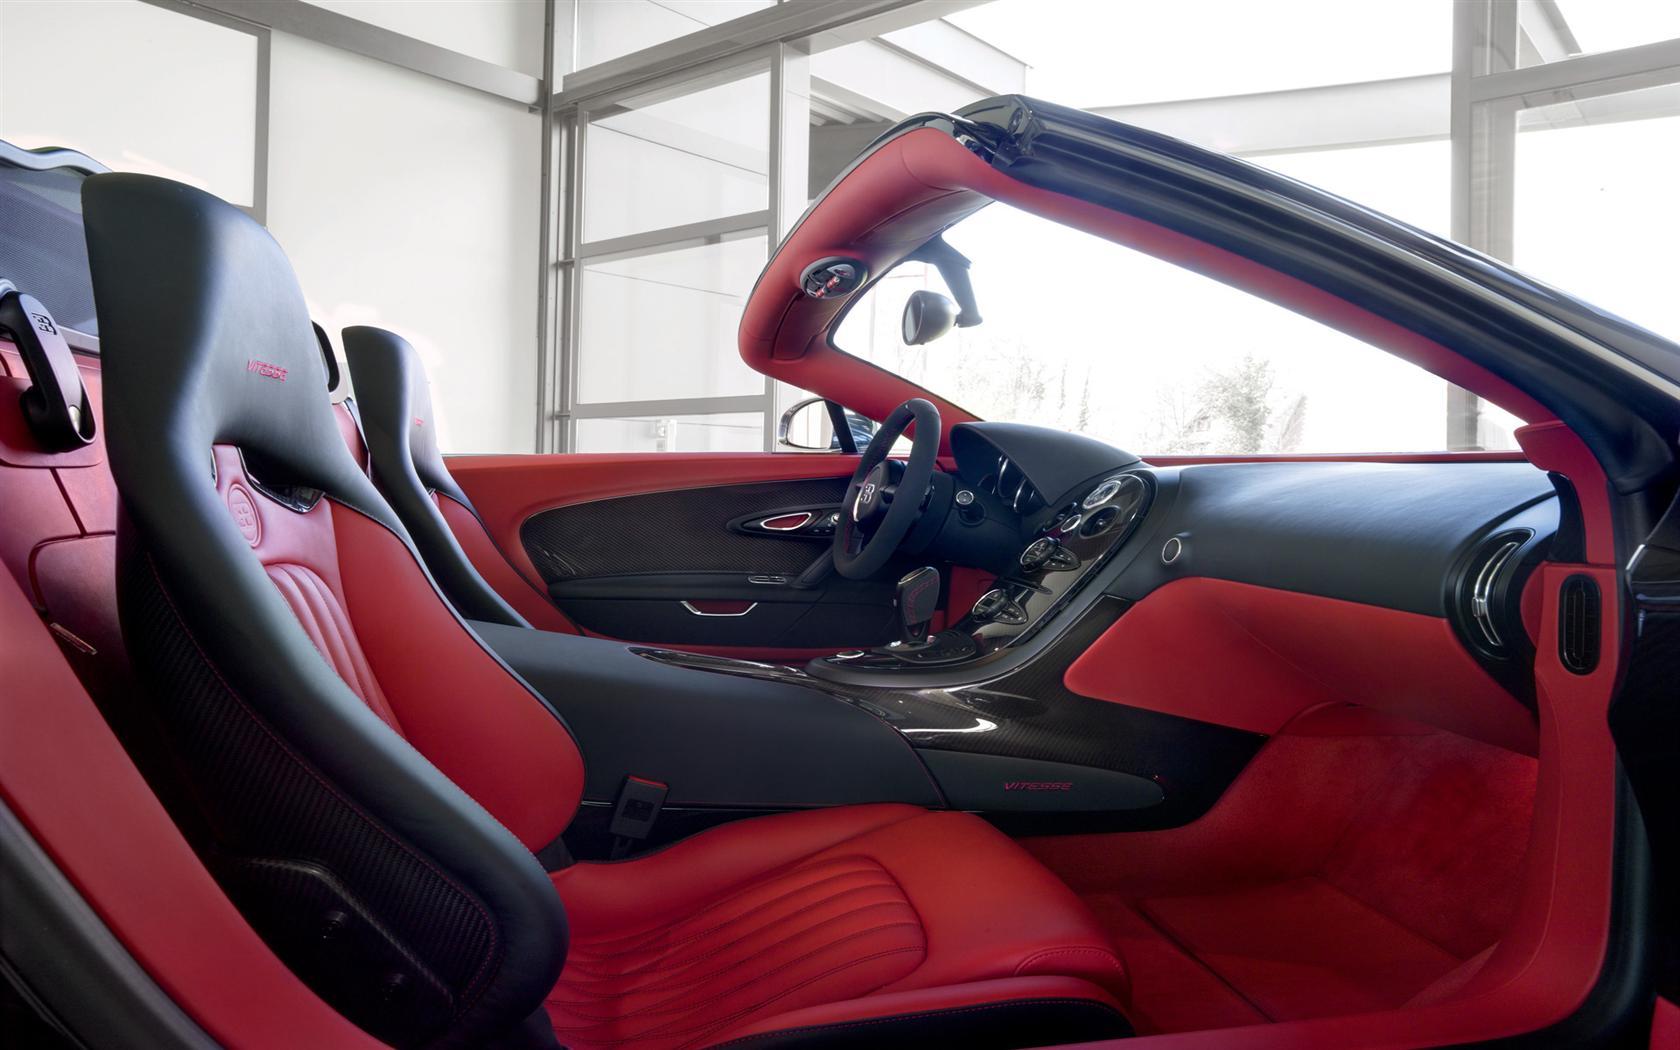 2012 bugatti veyron grand sport vitesse black and red image. Black Bedroom Furniture Sets. Home Design Ideas